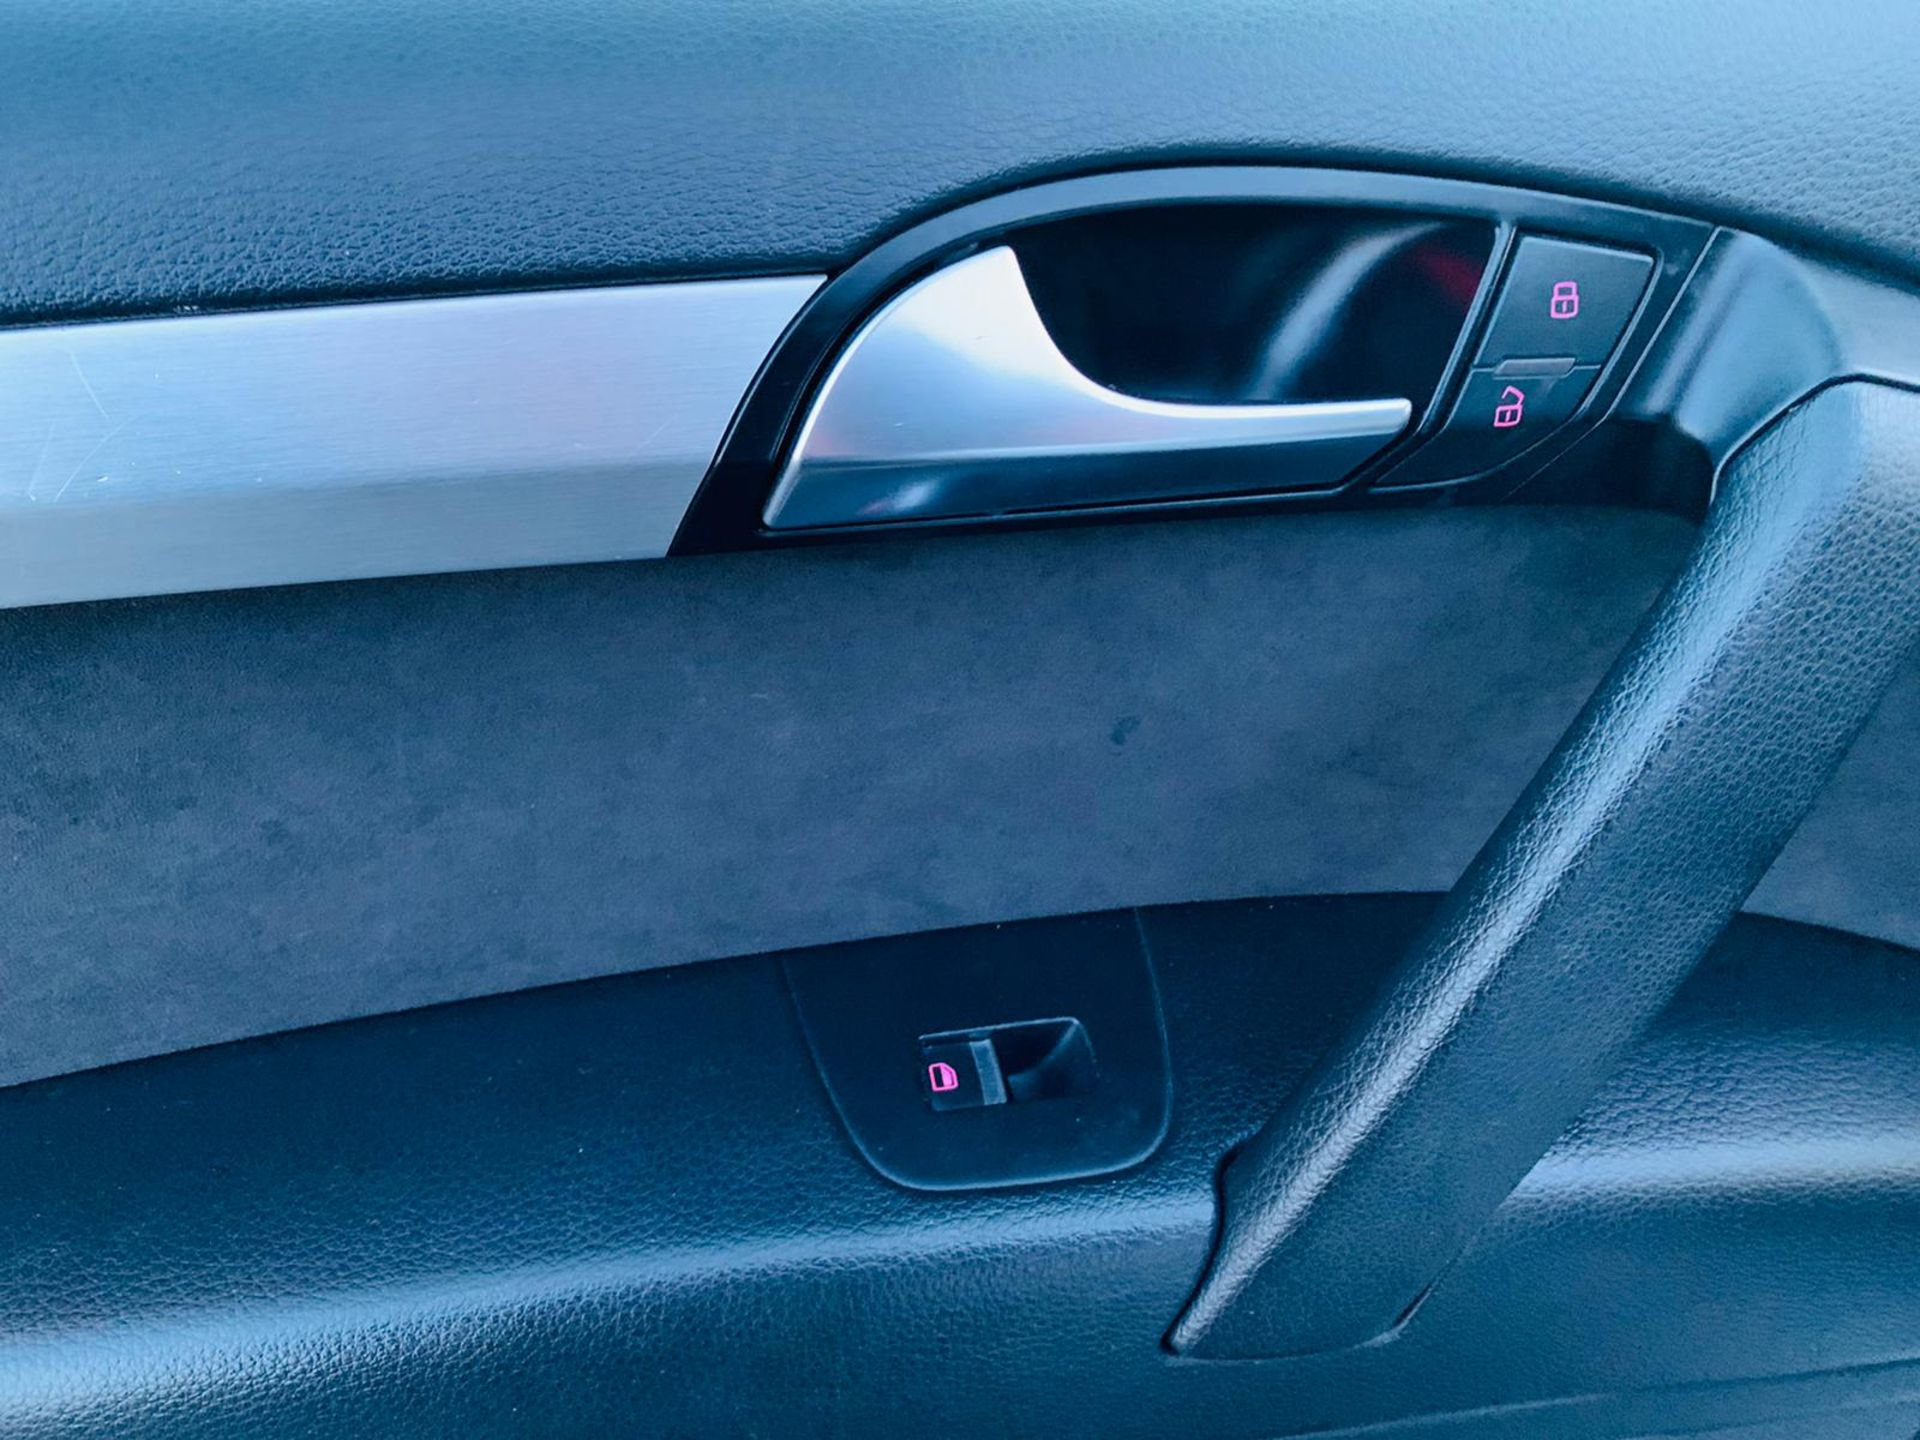 (Reserve Met)Audi Q7 3.0 TDI Quattro S Line Plus Auto (7 Seats) - 12 Reg - Only 63k Miles -Sat Nav- - Image 30 of 37